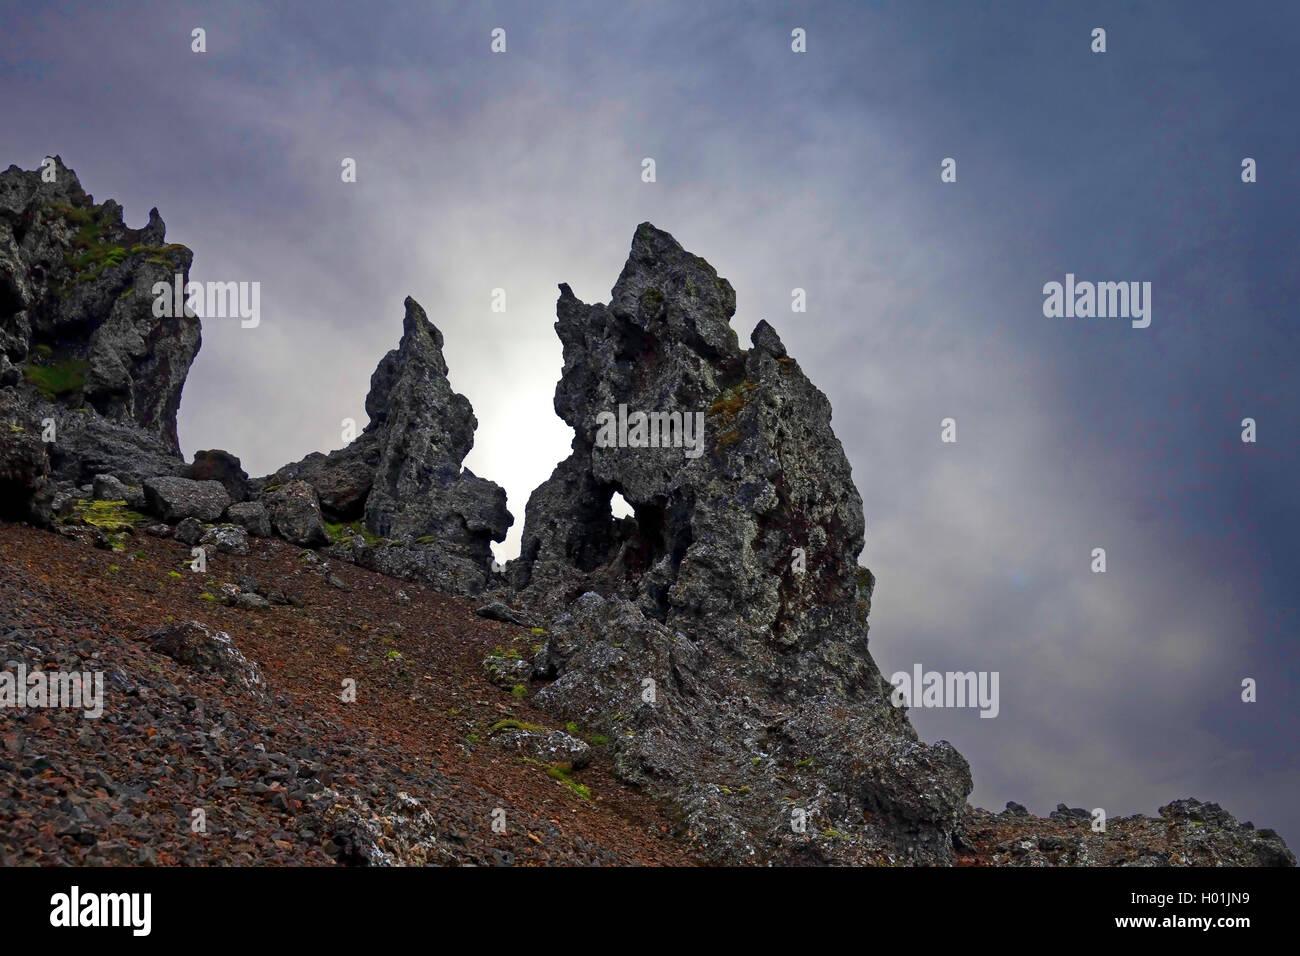 mystisch wirkende Lavaformation am Kolbeinsstadarfjall, Island, Snaefellsnes | weirdly shaped lava rocks of Kolbeinsstadarfjall, - Stock Image